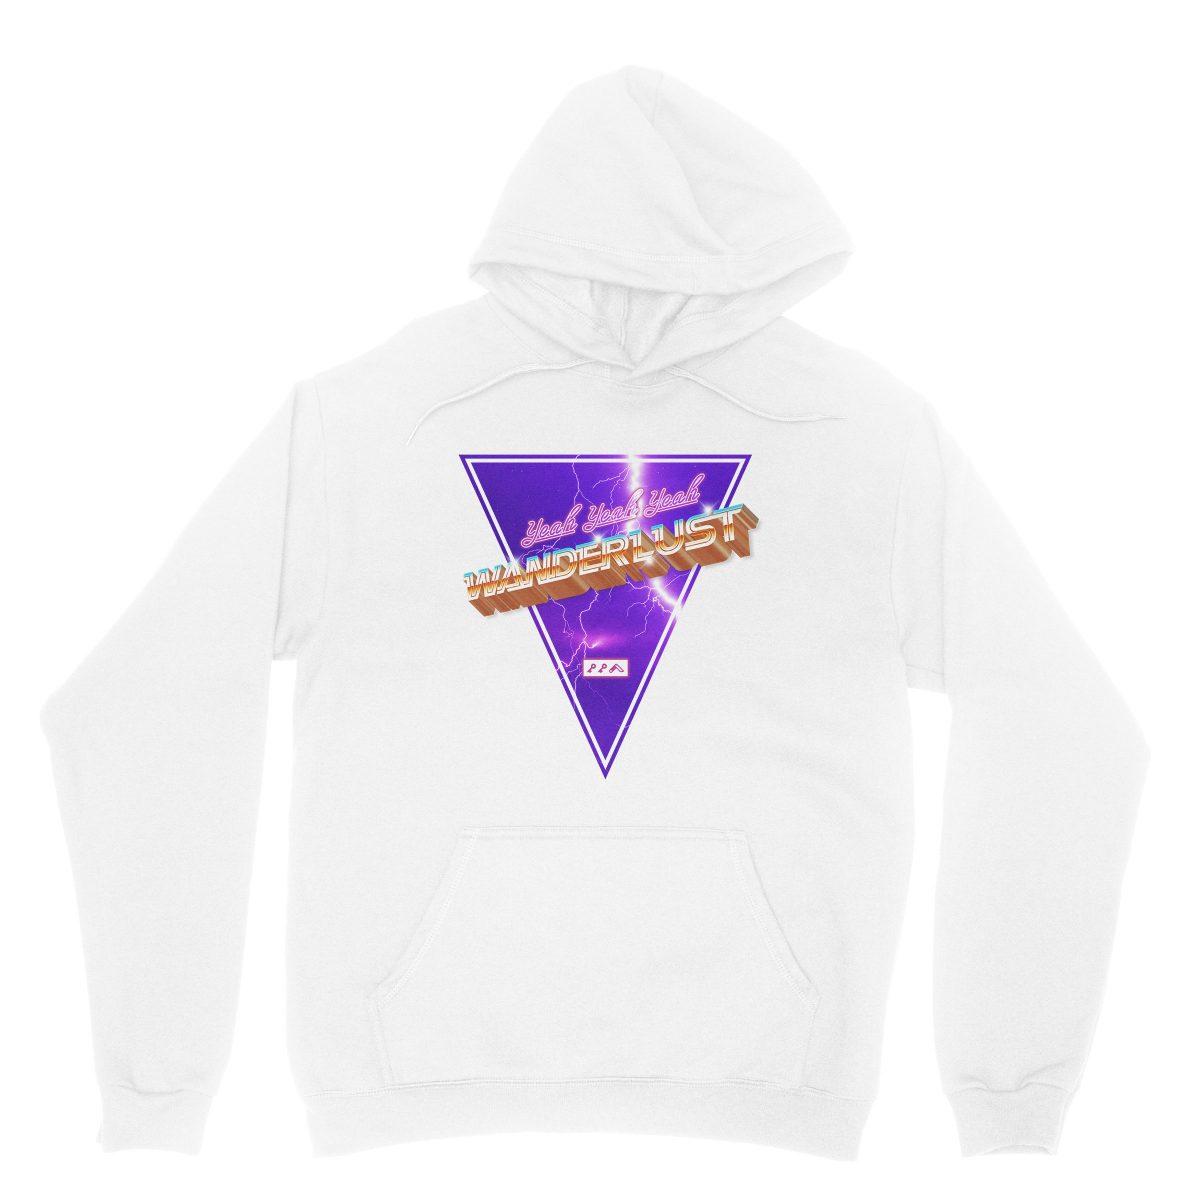 """WANDERLUST"" music festival artist hoodie in white"